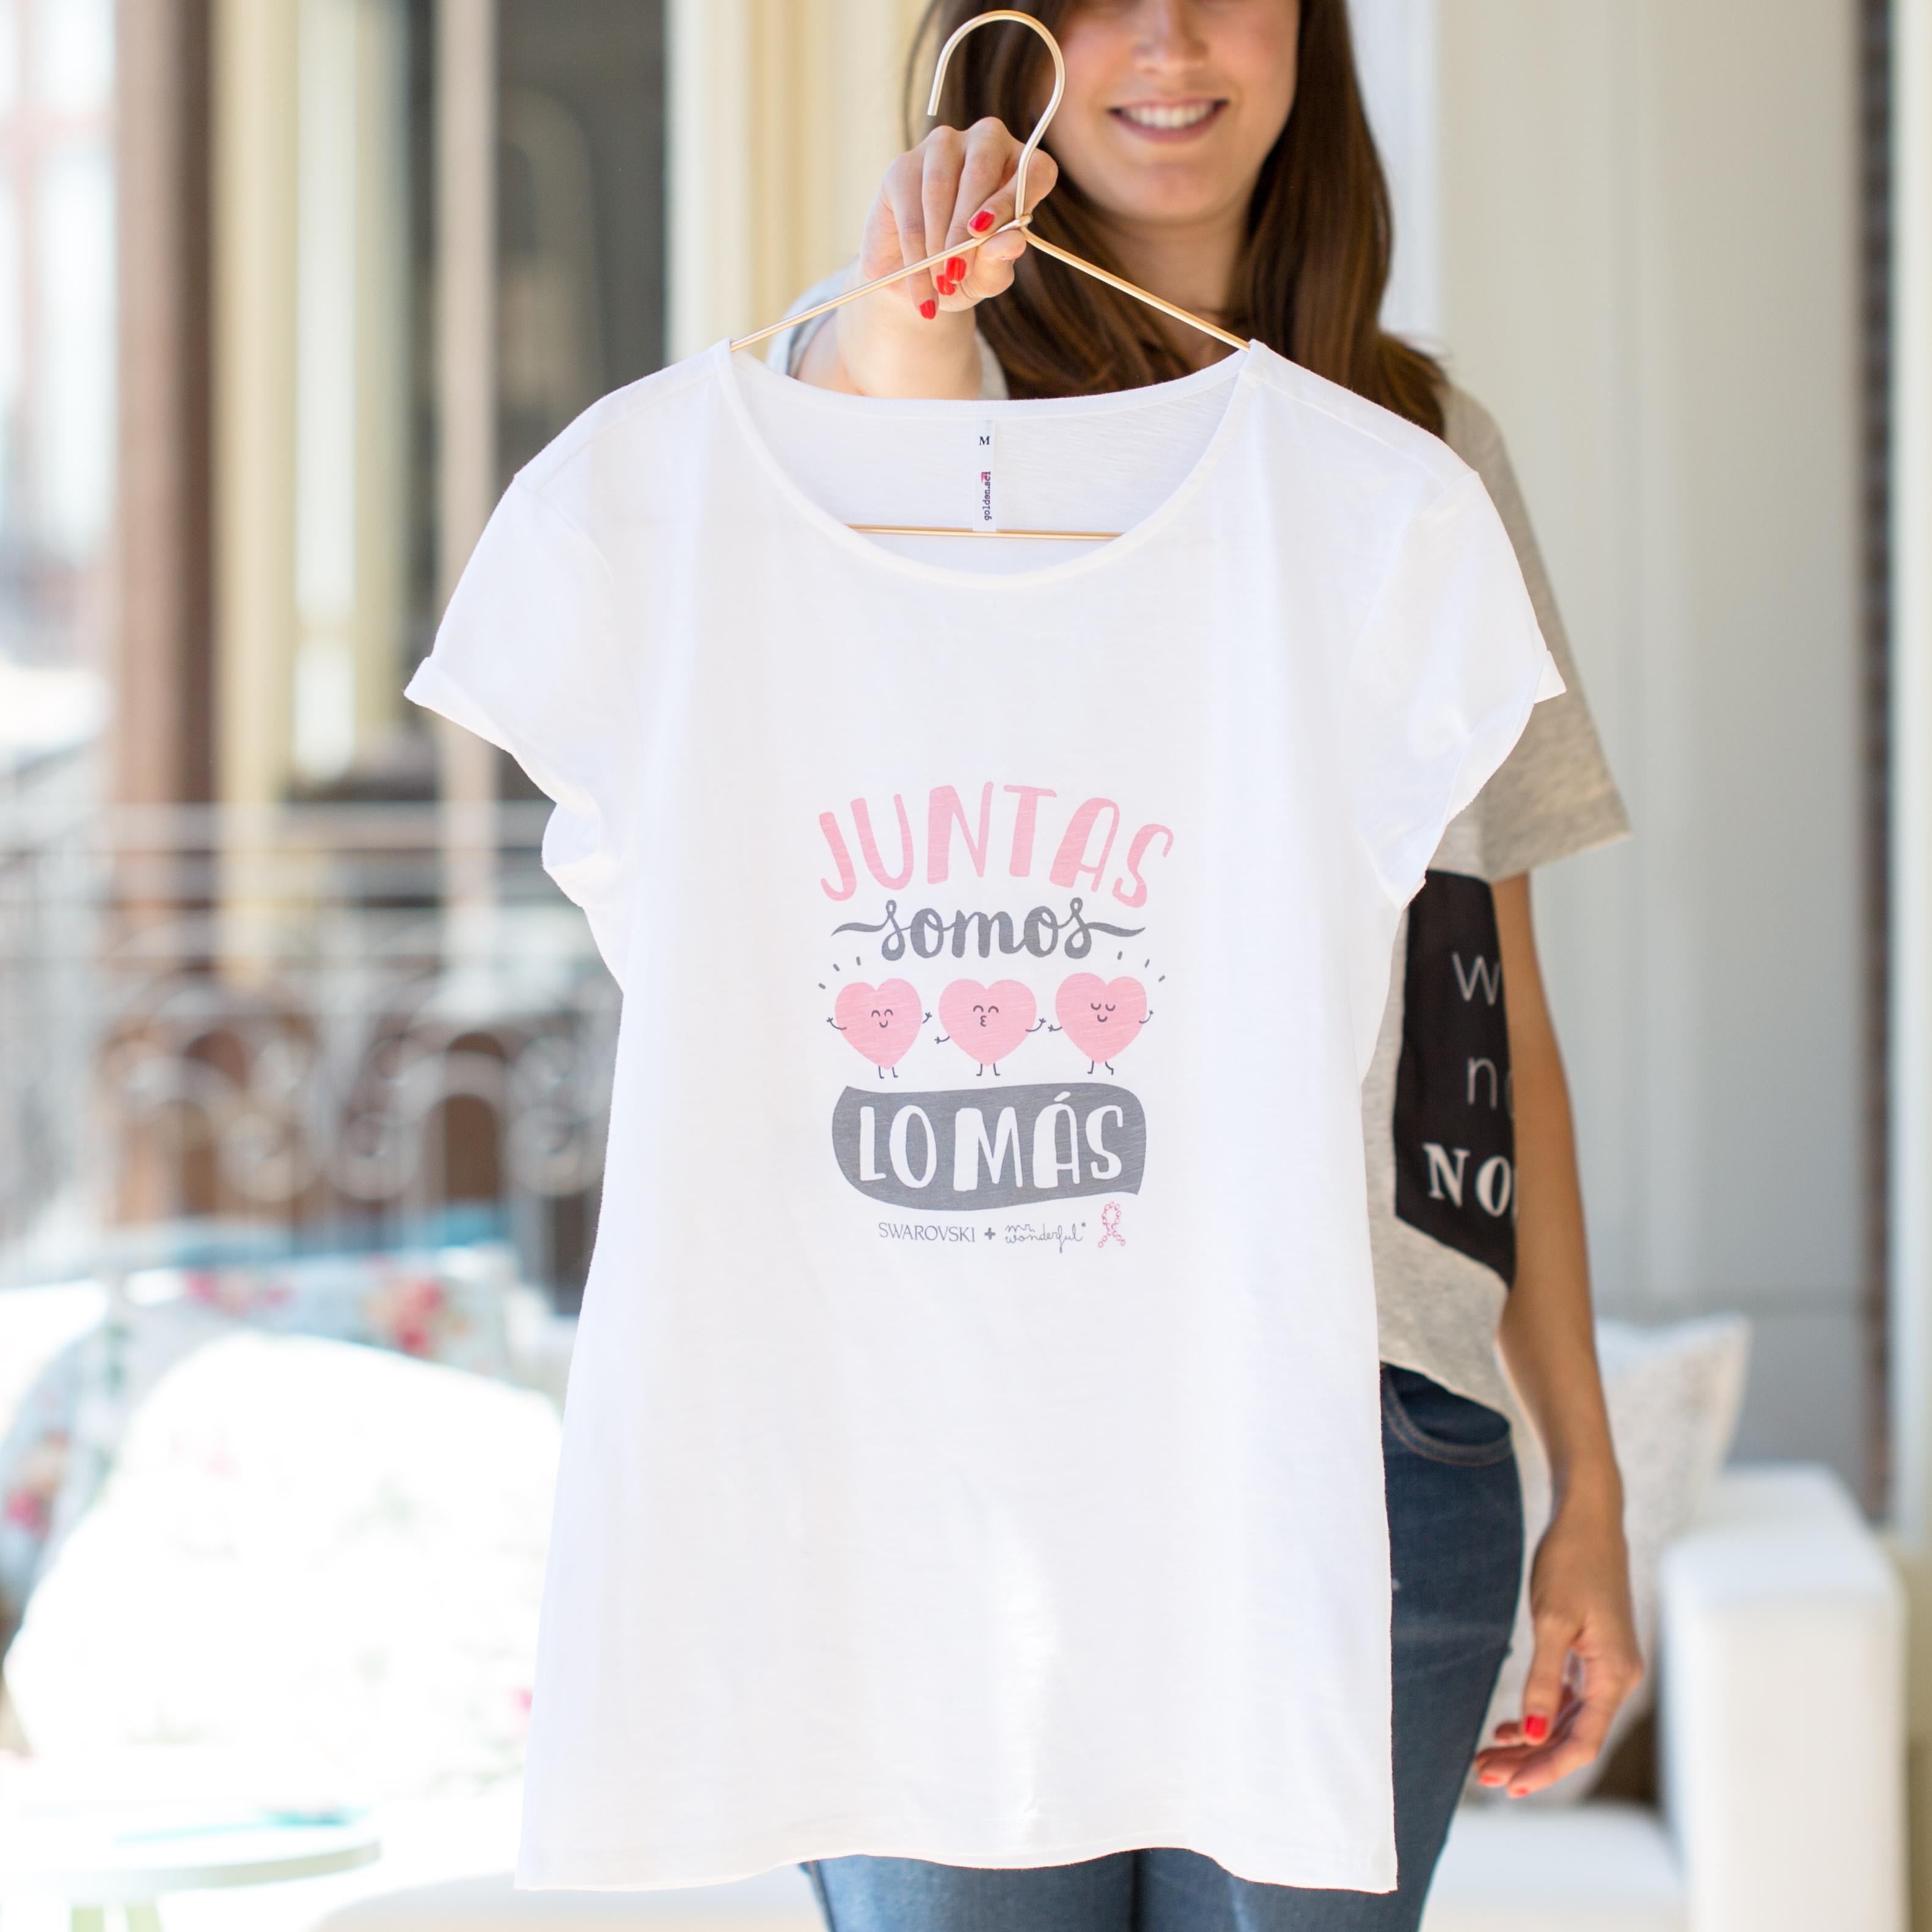 mrwonderful_camisetas_swarovski-22